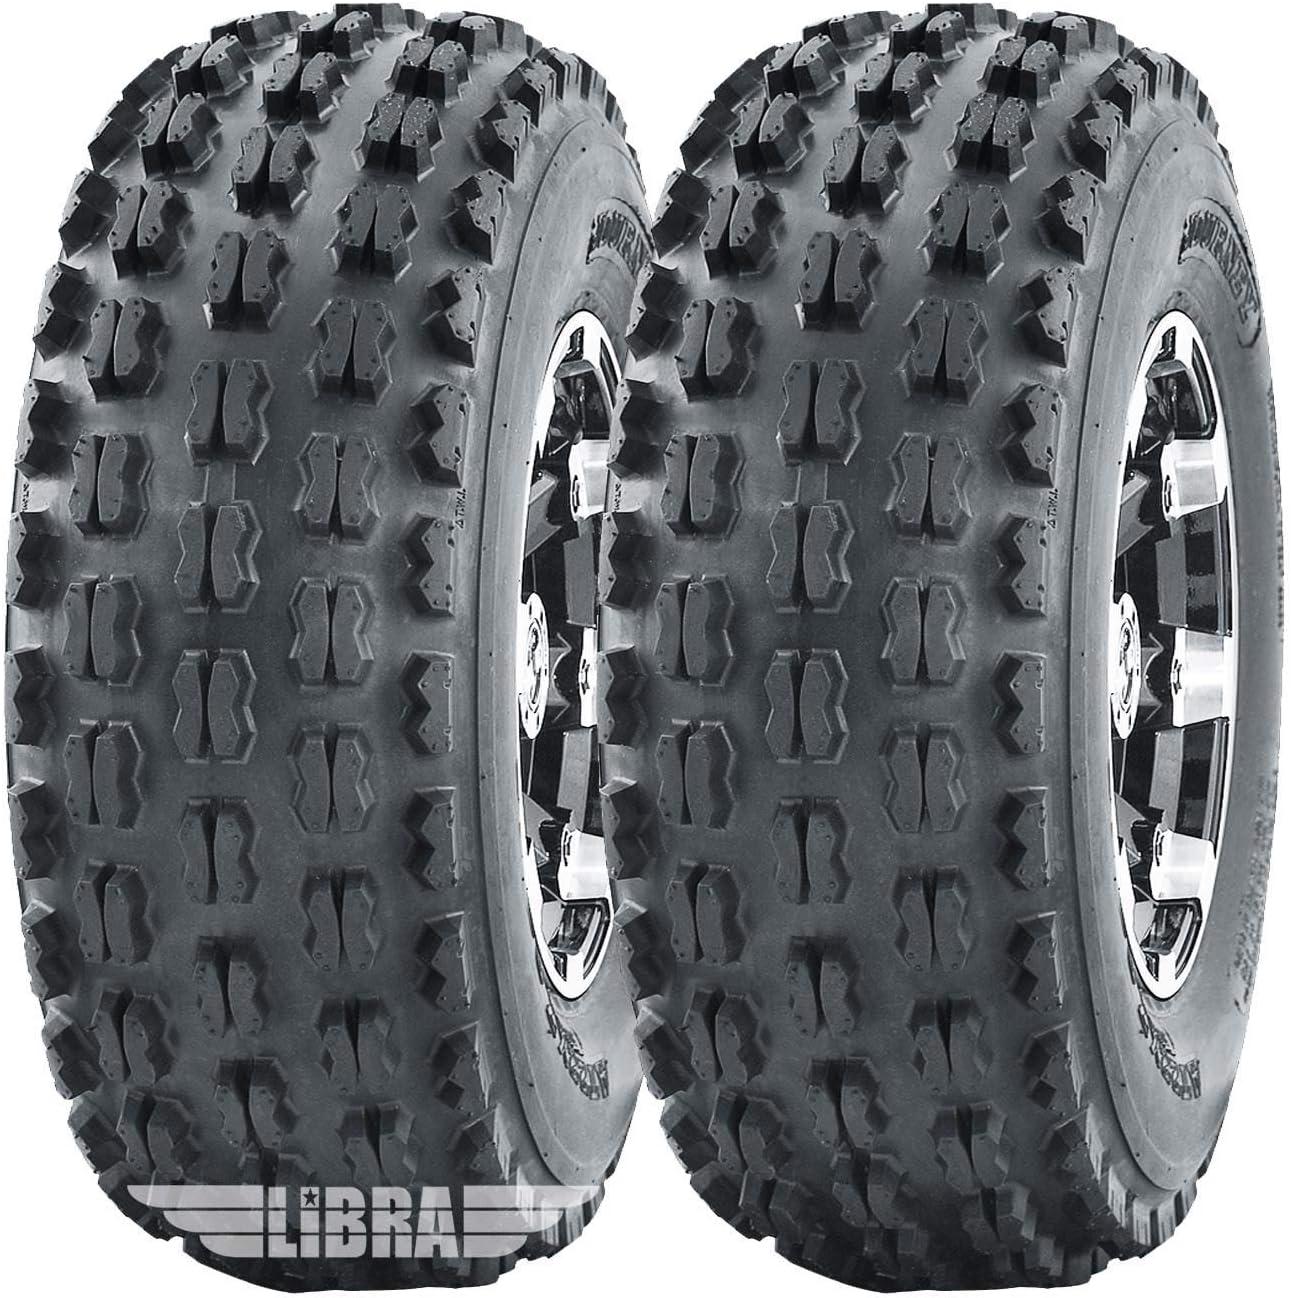 2 WANDA Sport 5 popular GNCC Racing Tires Raptor Yamaha fit for Max 79% OFF 21x7-10